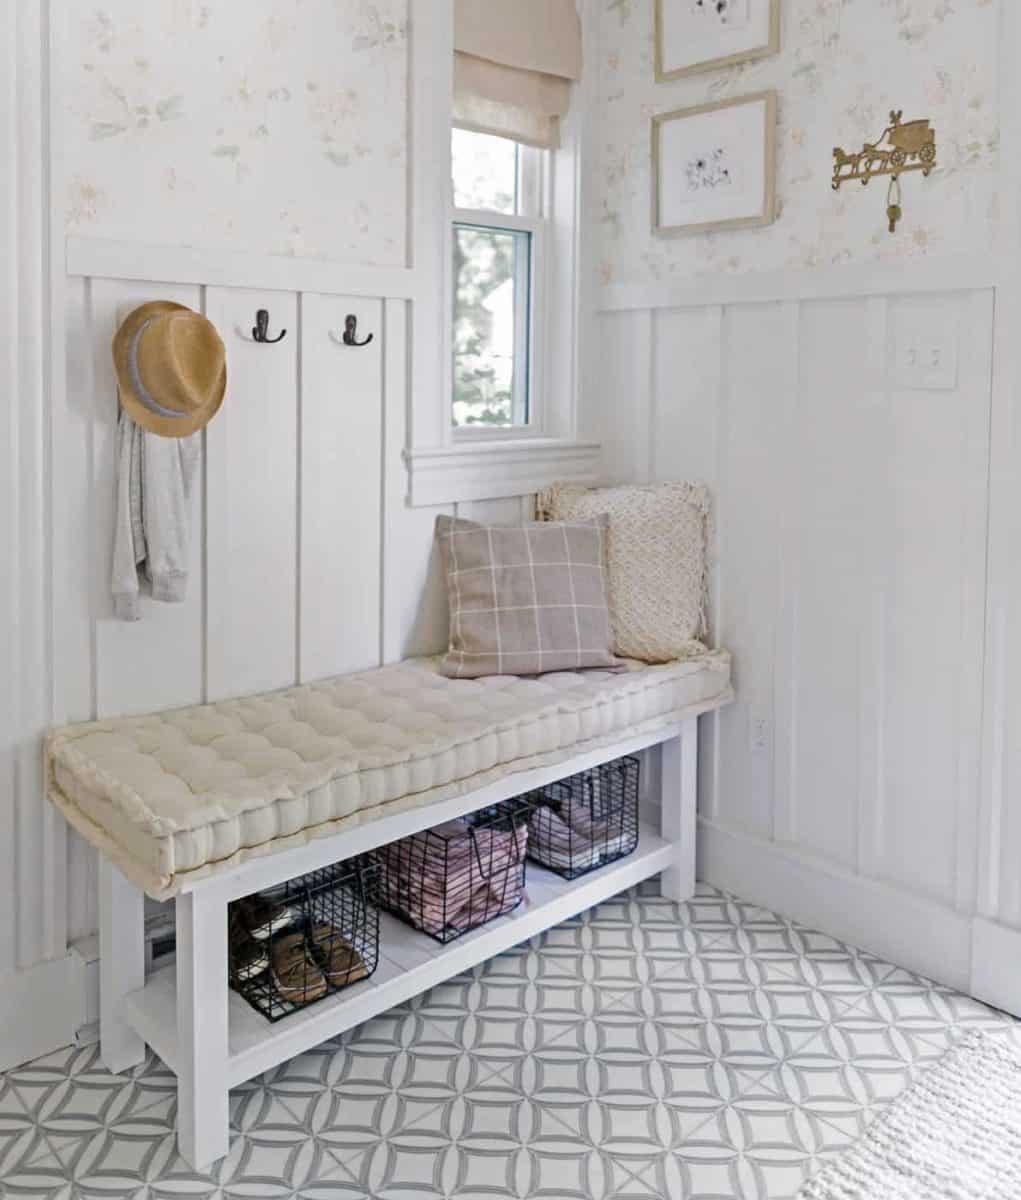 Ellipse Blue Laundry Room Floor Jacquelyn Clark